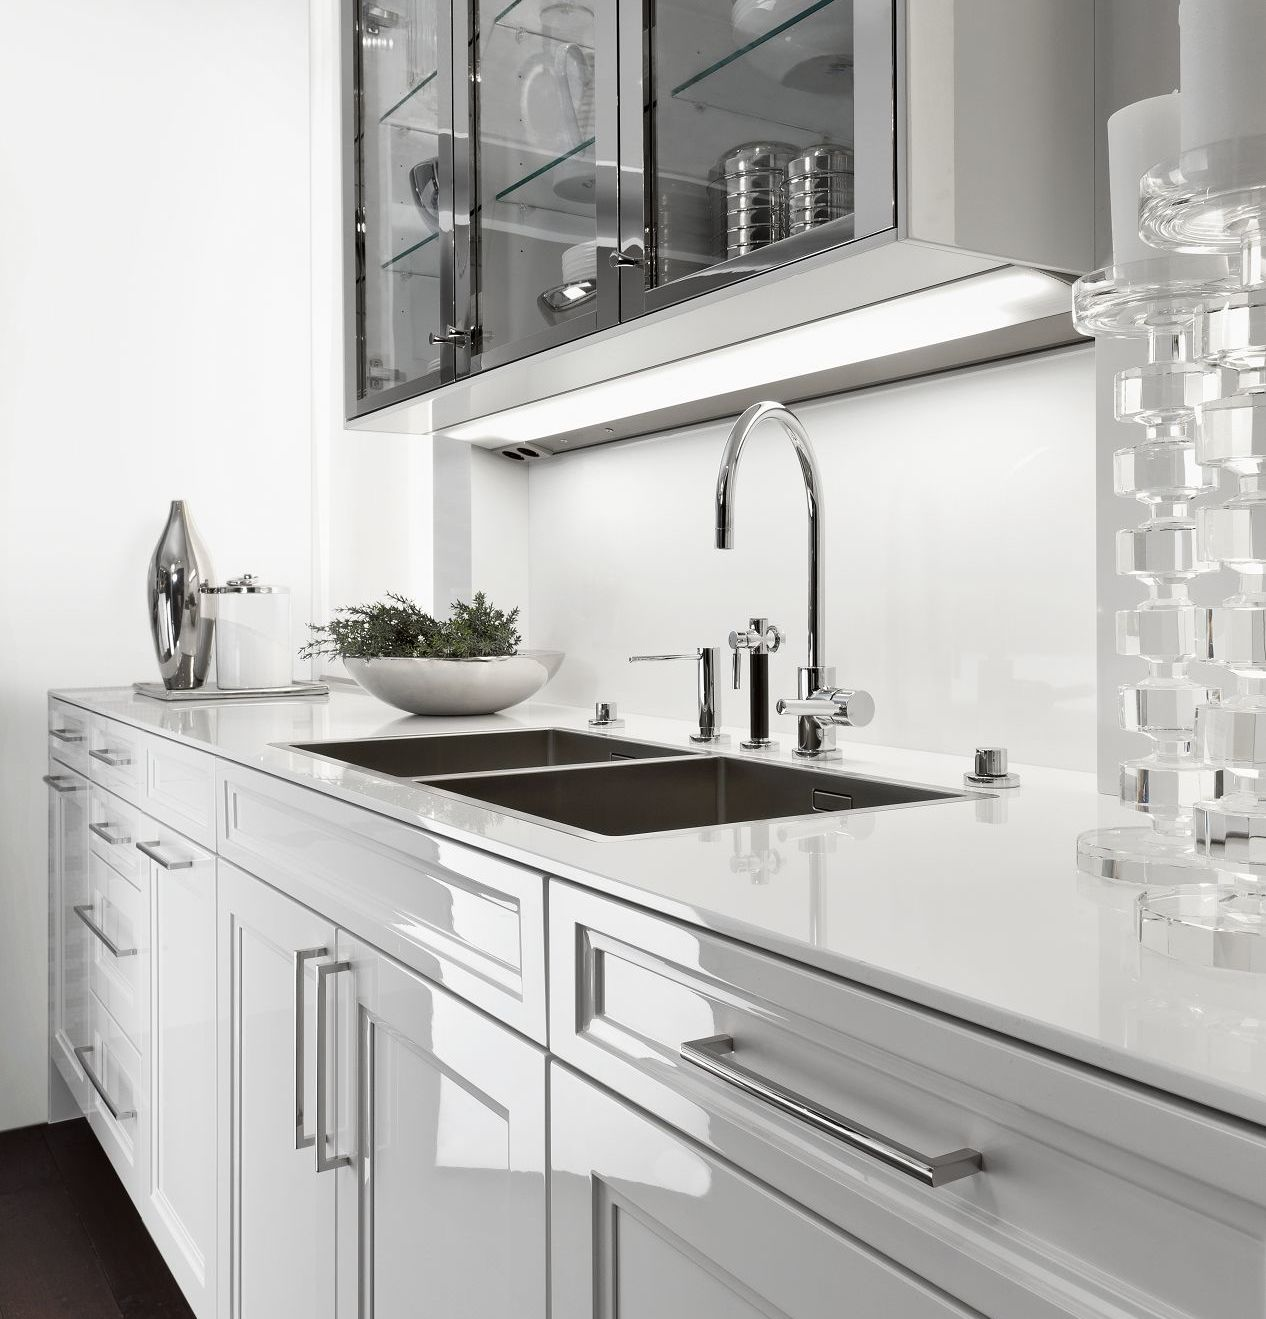 Kchenhaus sd top amazing inspiration wandfarbe aldi und - Glanzende wandfarbe ...